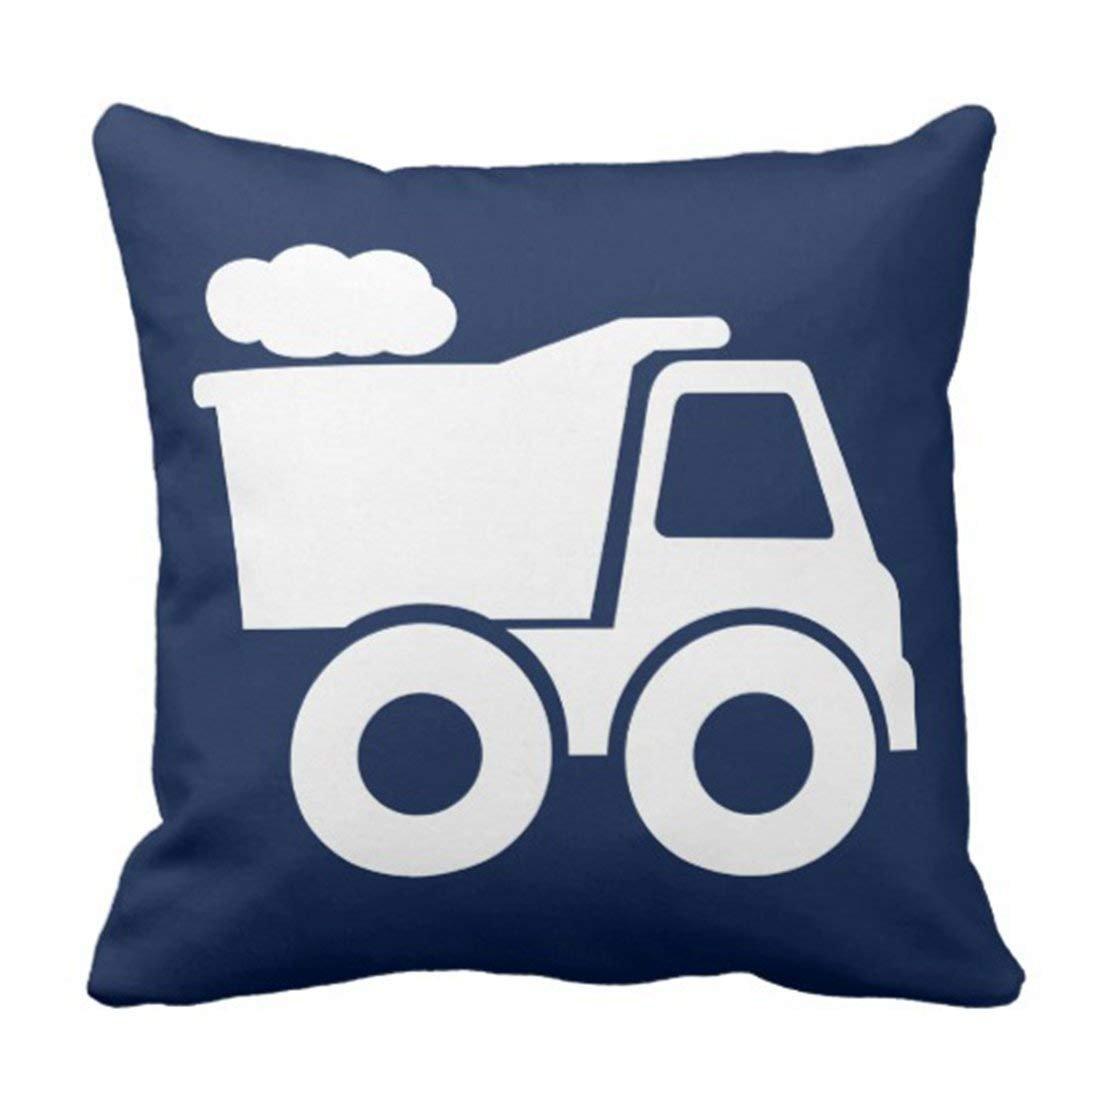 Feesoz Throw Pillow Cover Nursery Dump Truck in Navy Blue Construction Decorative Pillow Case Home Decor Square 18 x 18 inch Pillowcase